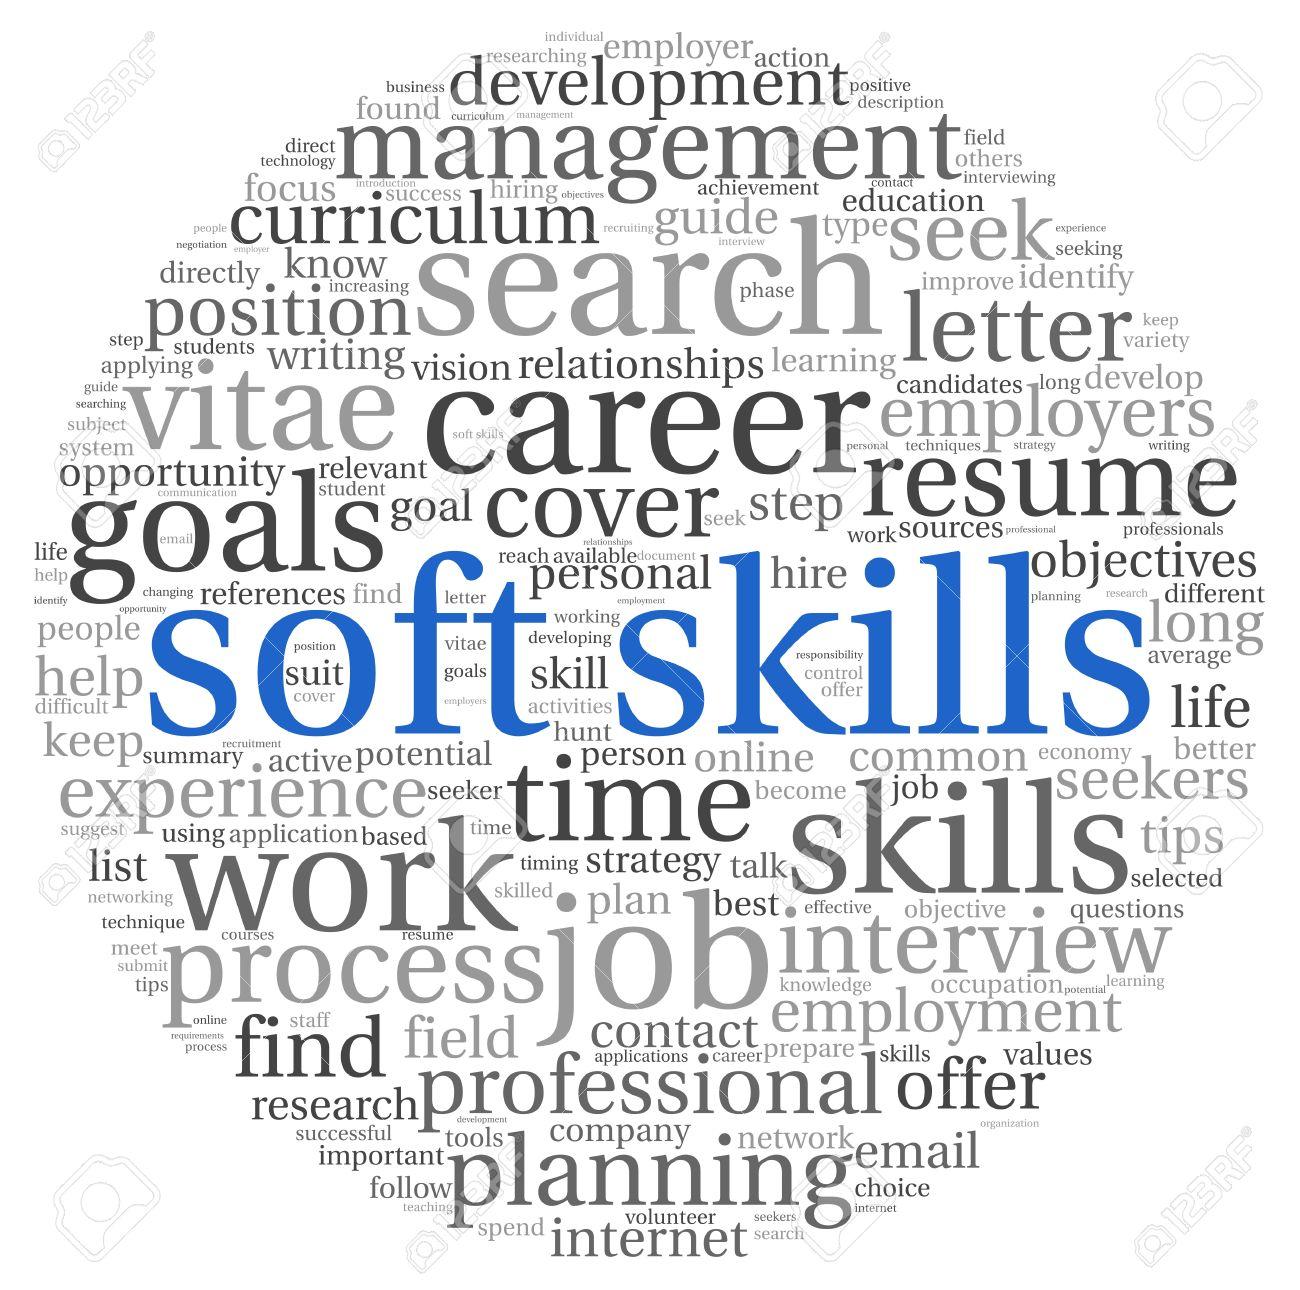 Soft Skills Training Companies